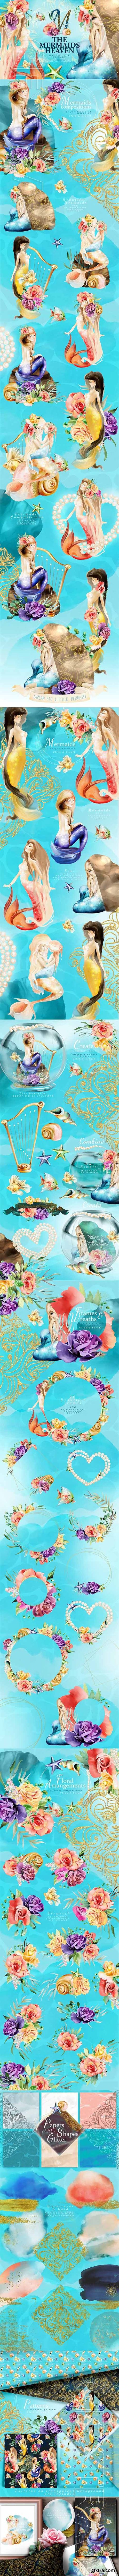 The Mermaids Heaven 2676788